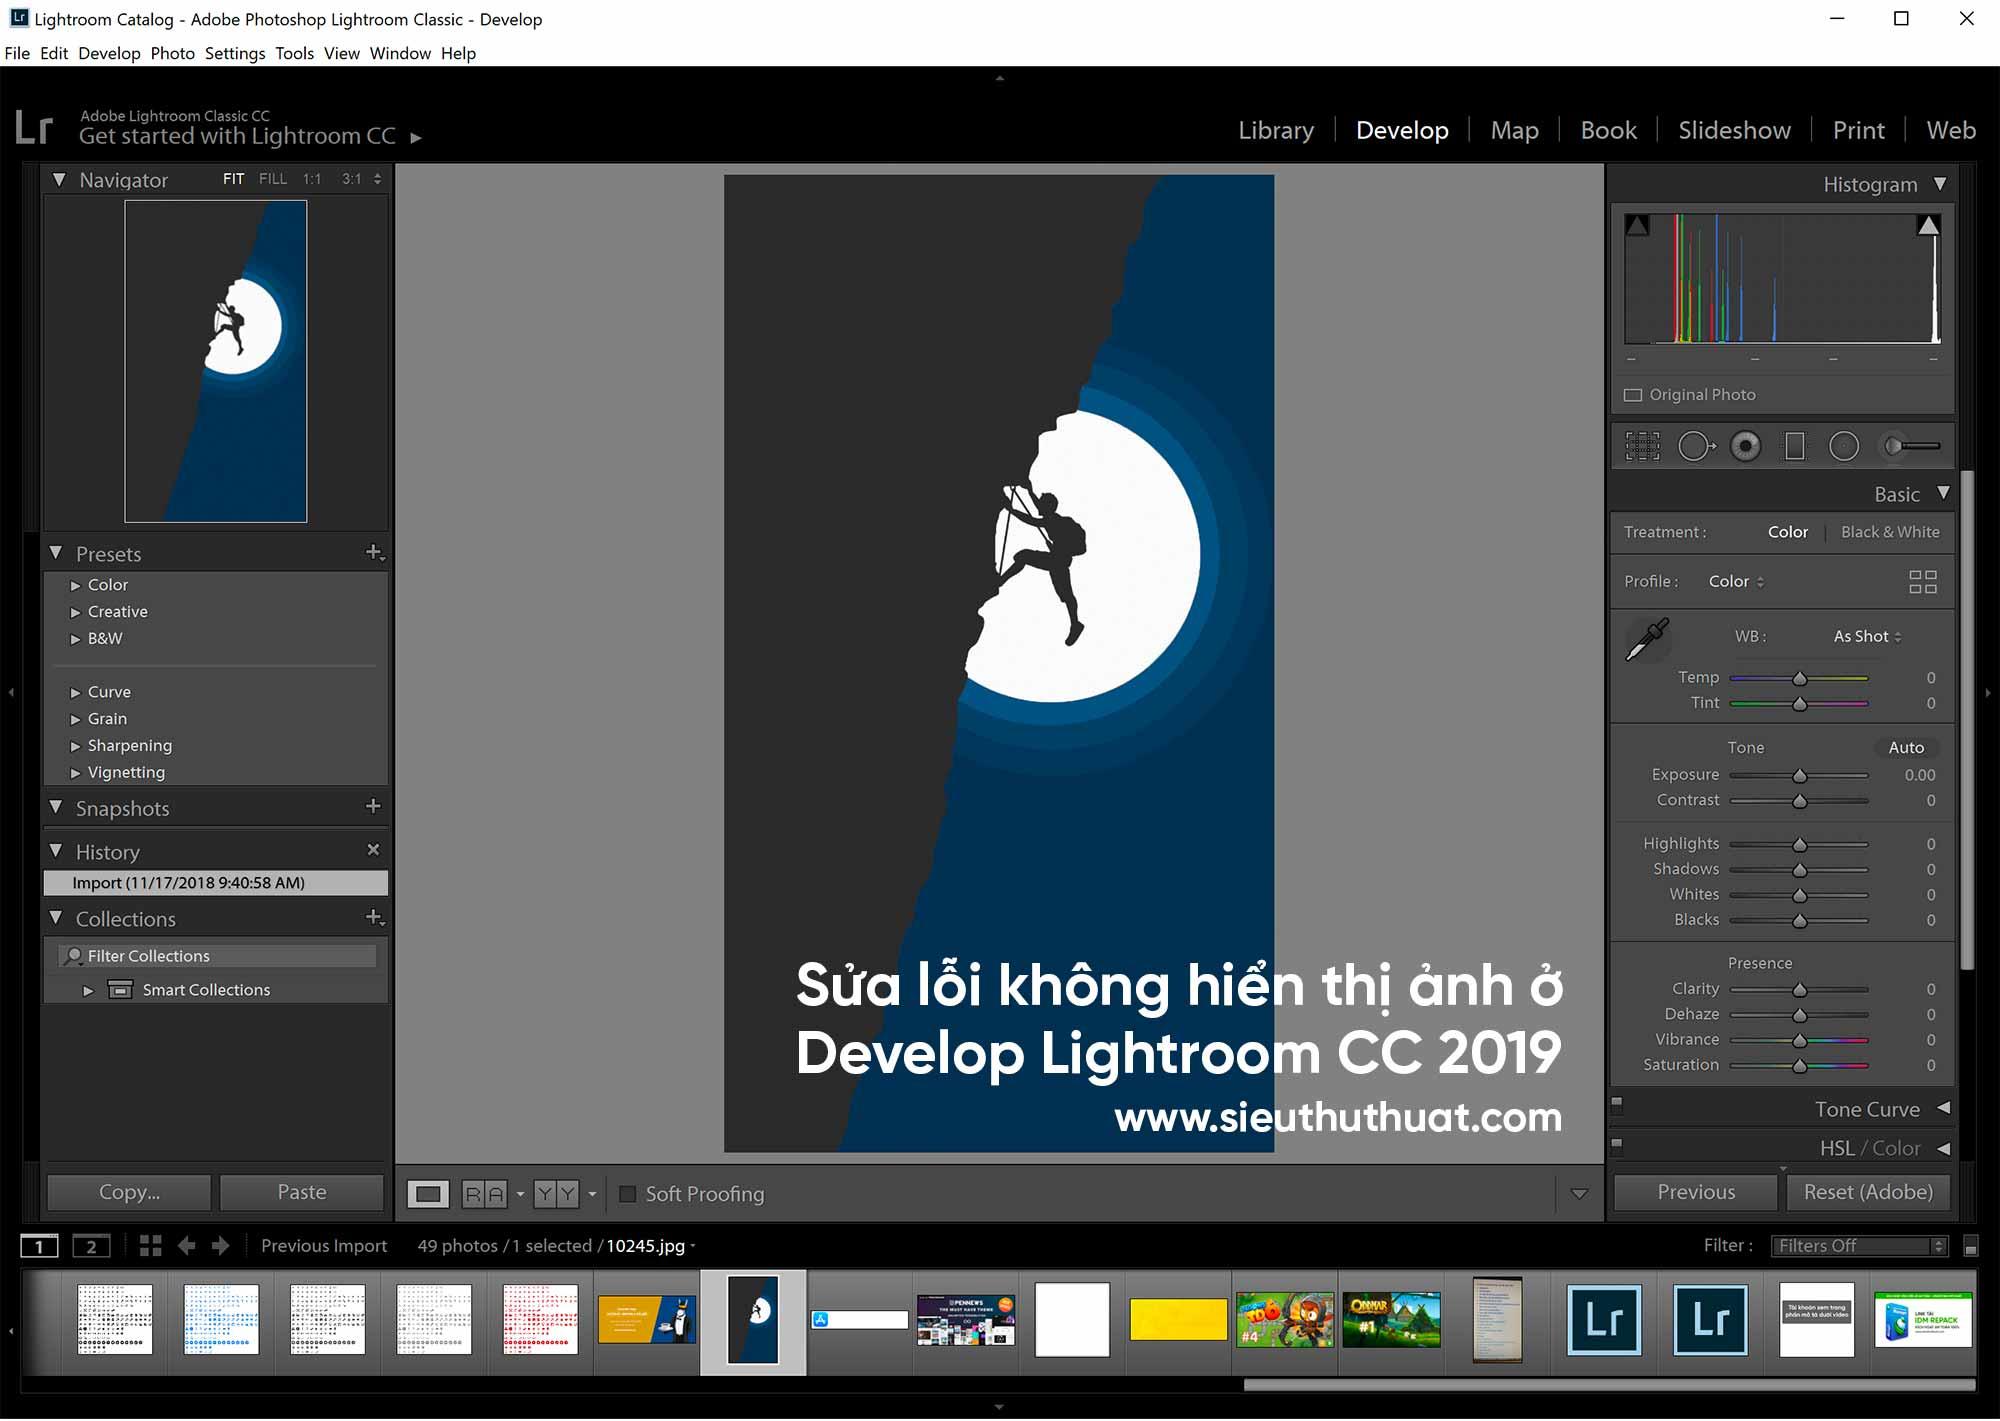 Fix-Develop-Module-Lightroom-CC-2019.jpg